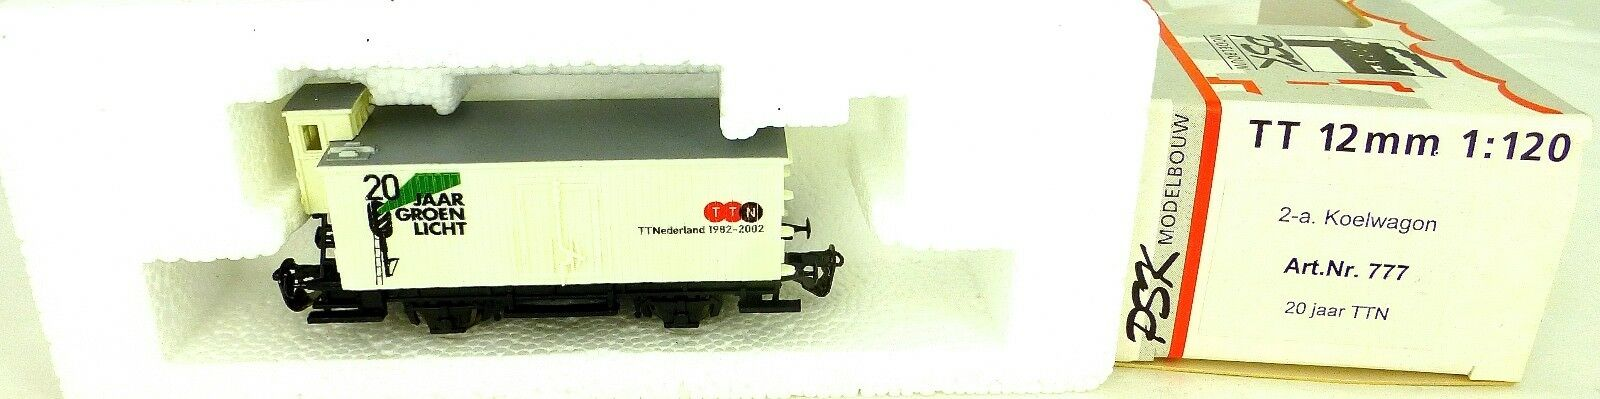 Psk 777 20 Jaar verde Luz Ttn 2-a Koelnwagon Tt Paises Bajos 1982-2002 1 120 Å